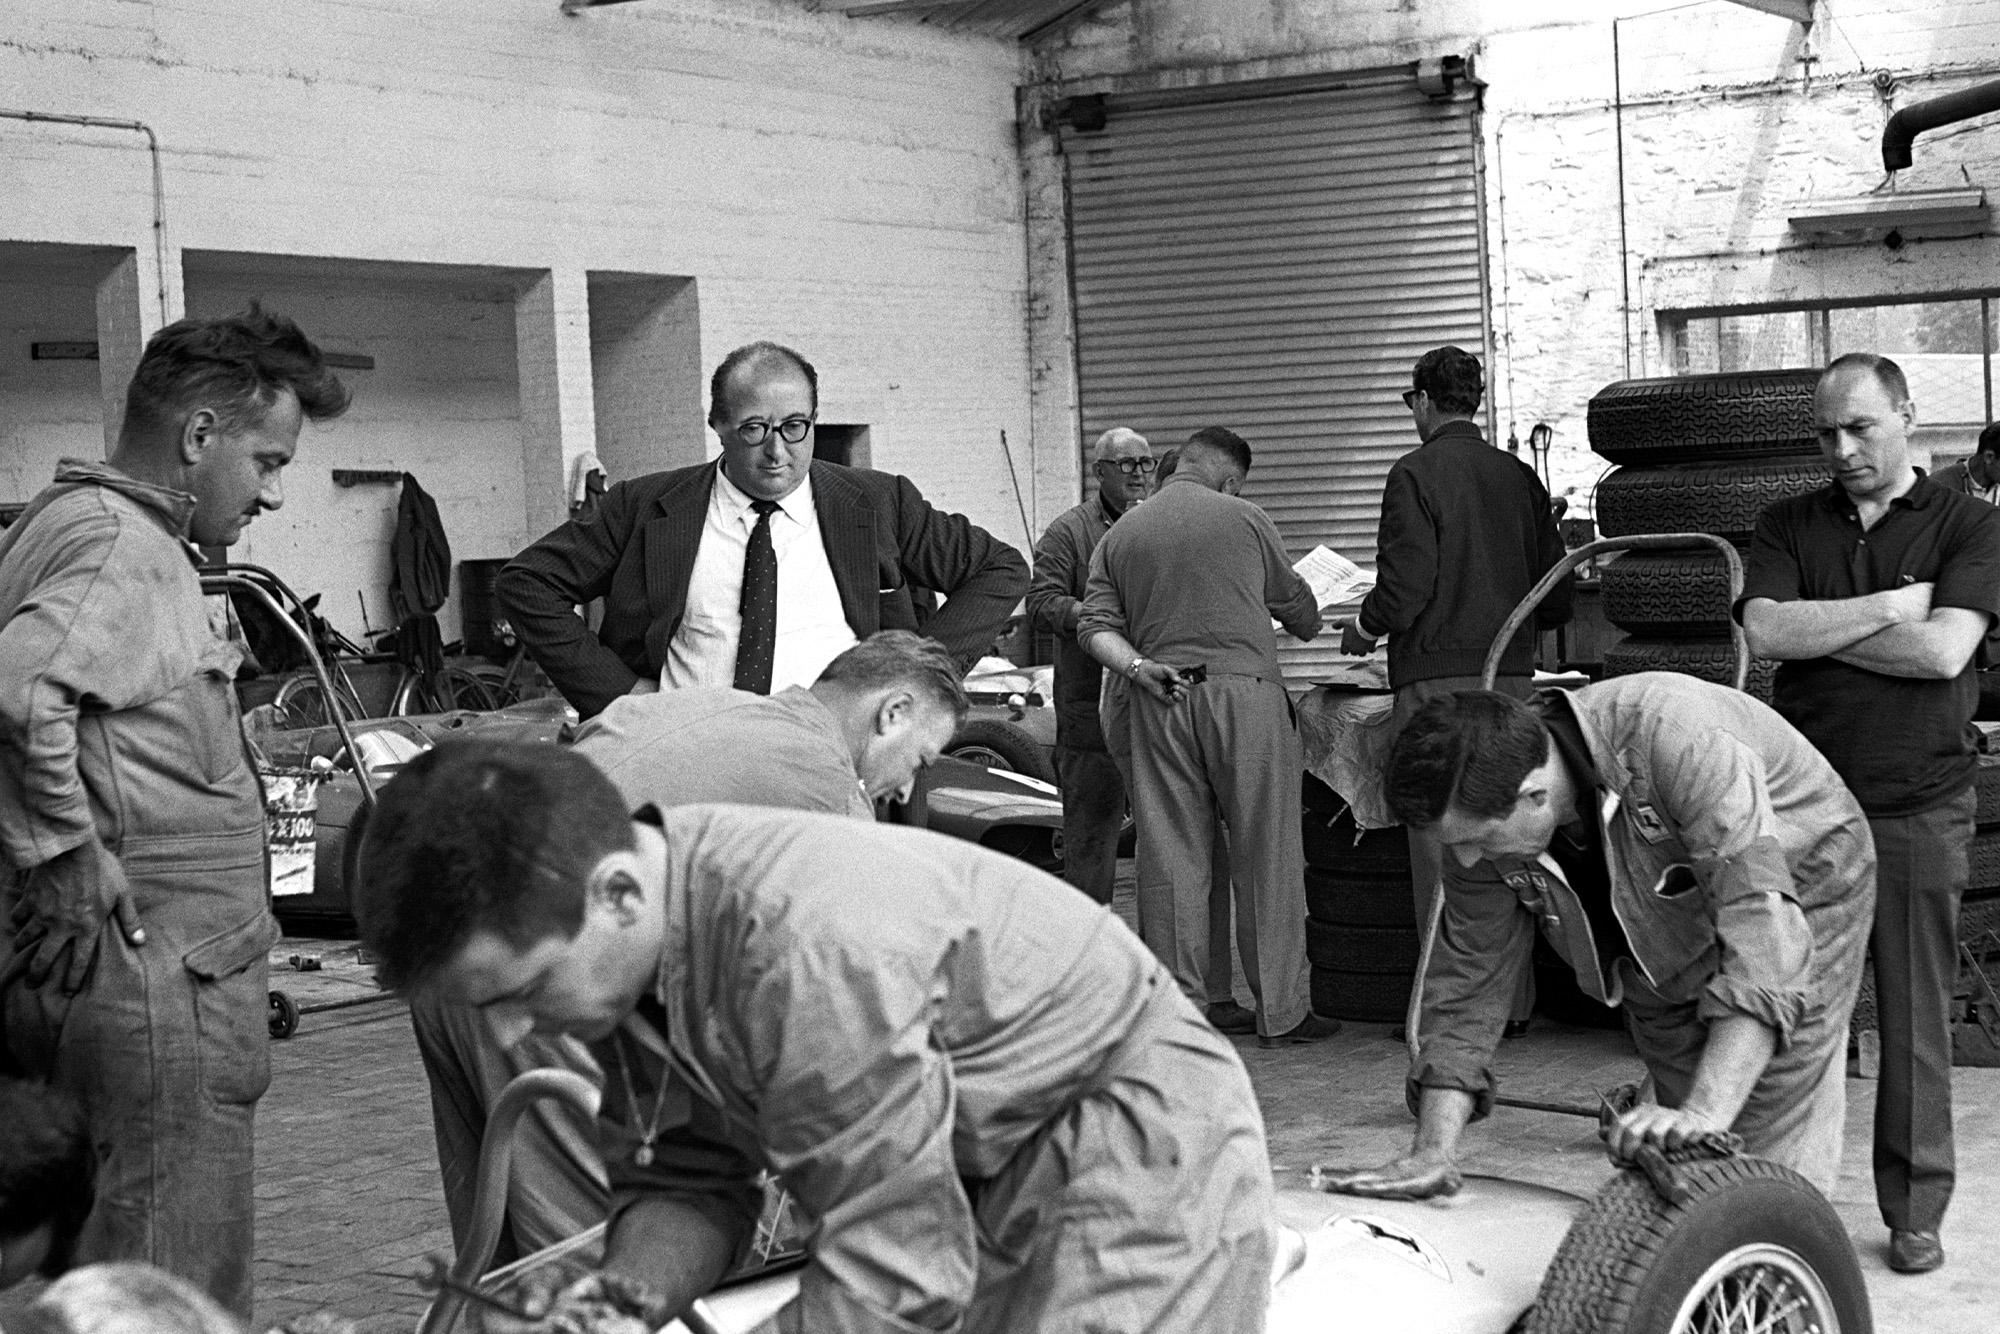 Carlo Chiti overseeing work to Ferrari 156s in the 1961 Belgian Grand Prix at Spa